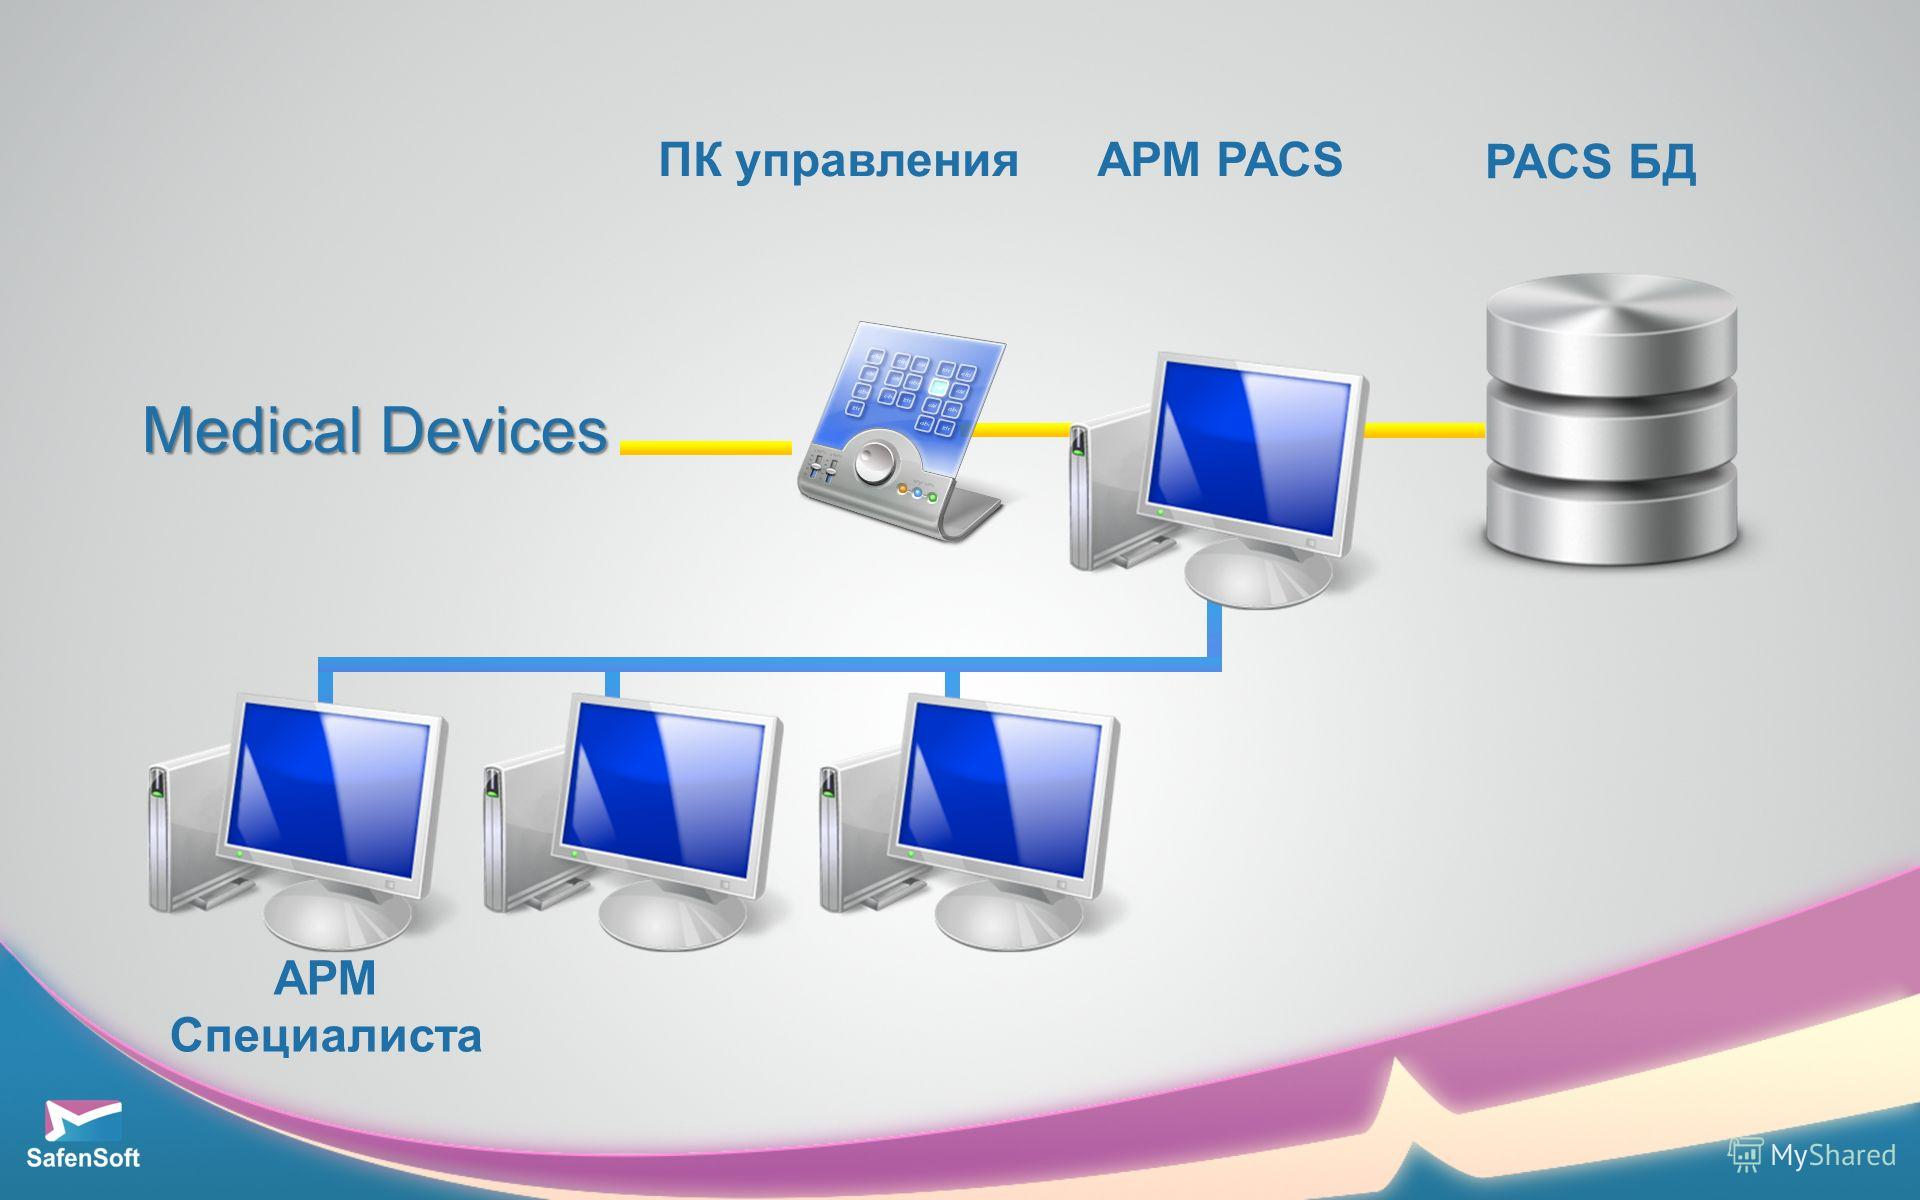 АРМ Специалиста АРМ PACS PACS БД Medical Devices ПК управления